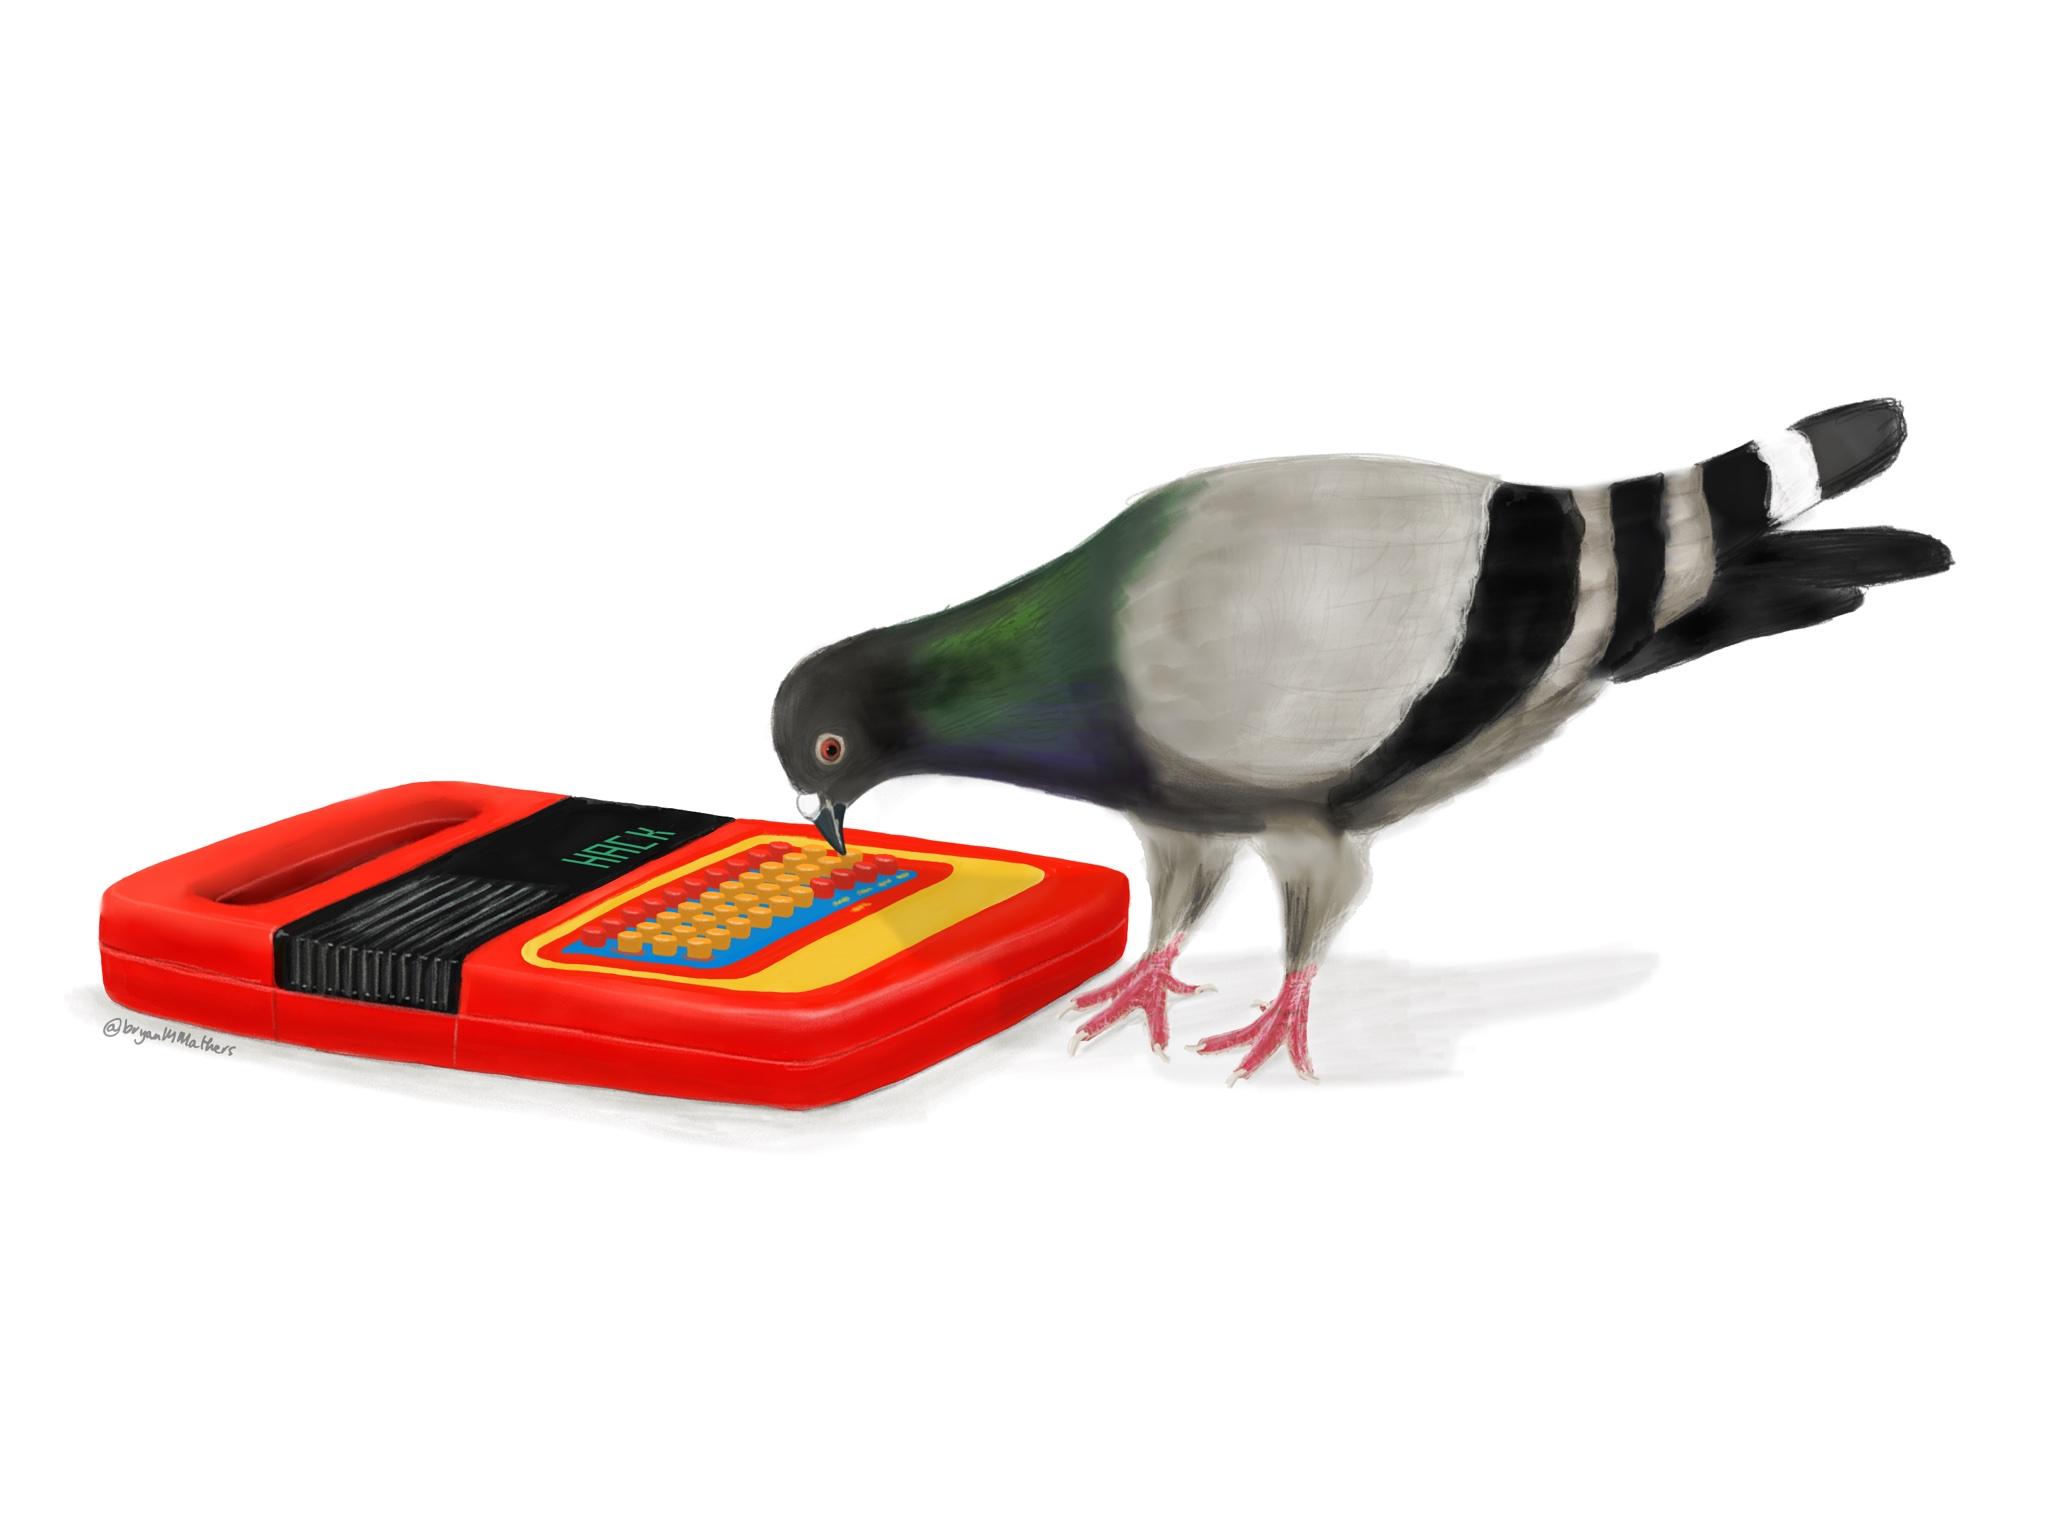 files/images/pigeon.jpg